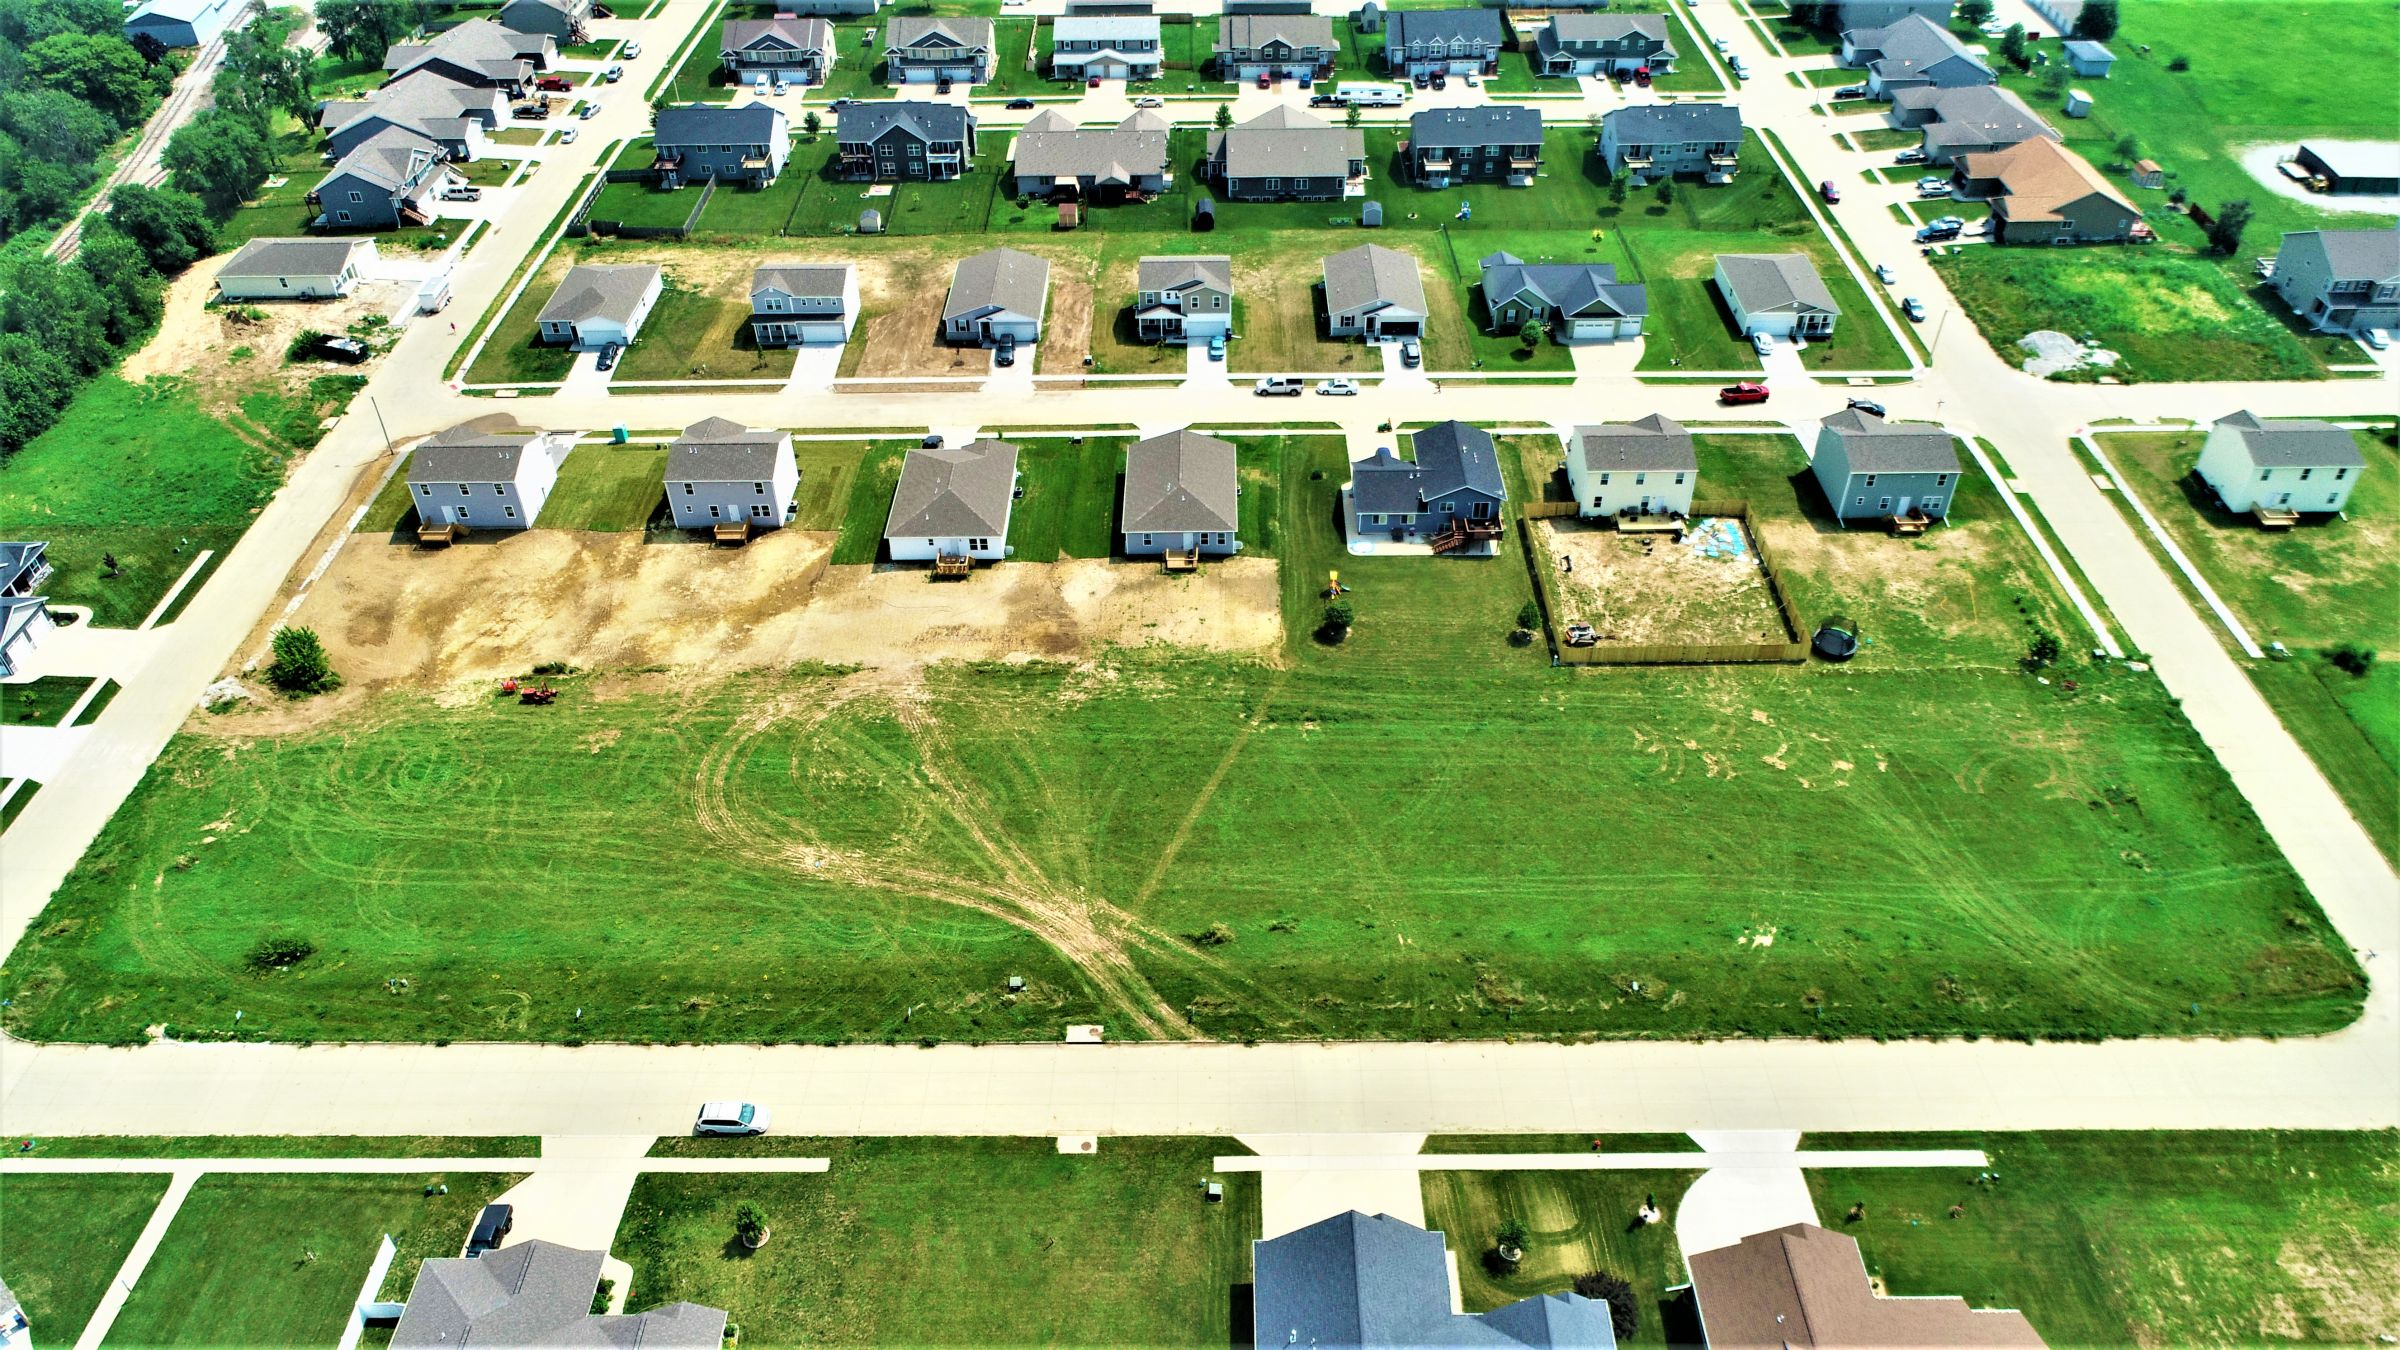 development-land-johnson-county-iowa-0-acres-listing-number-15760-11-2021-09-21-193117.JPG